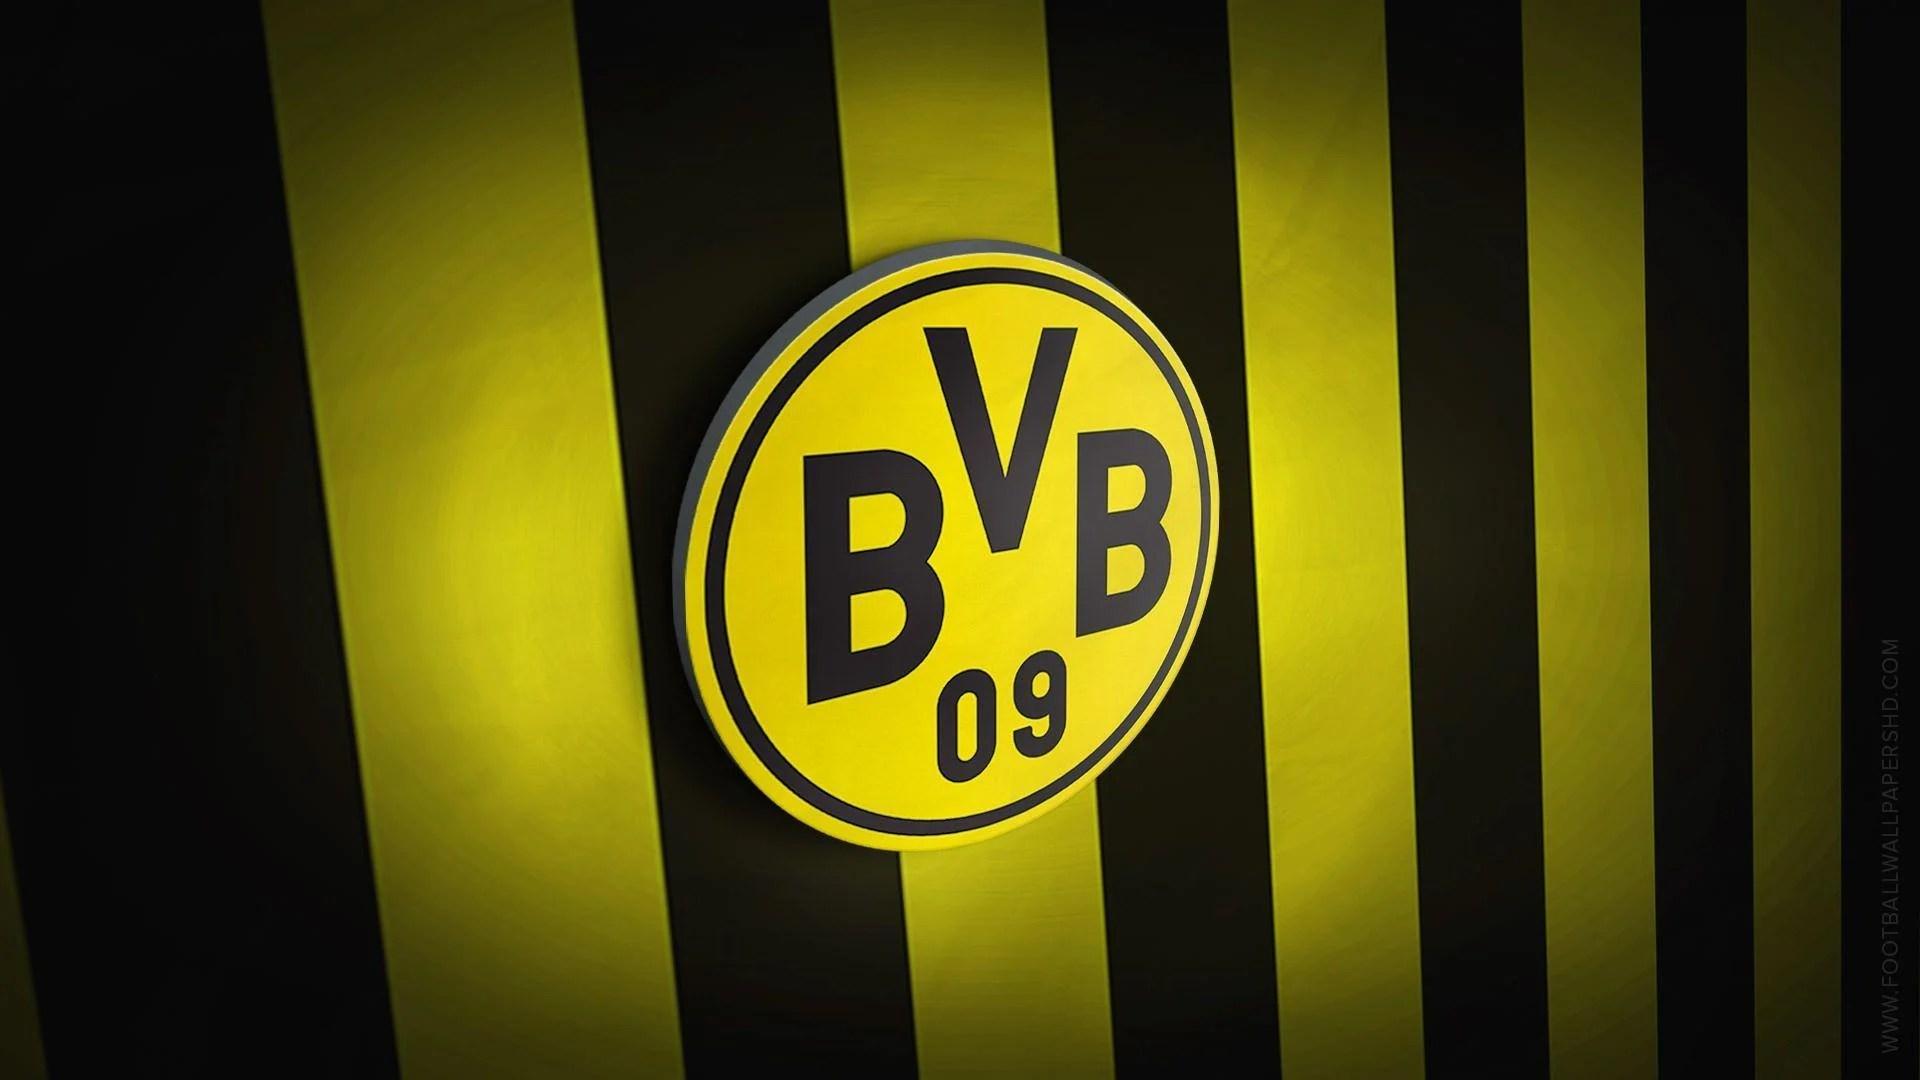 Fall Out Boy Logo Wallpaper Borussia Dortmund Wallpapers Wallpaper Cave